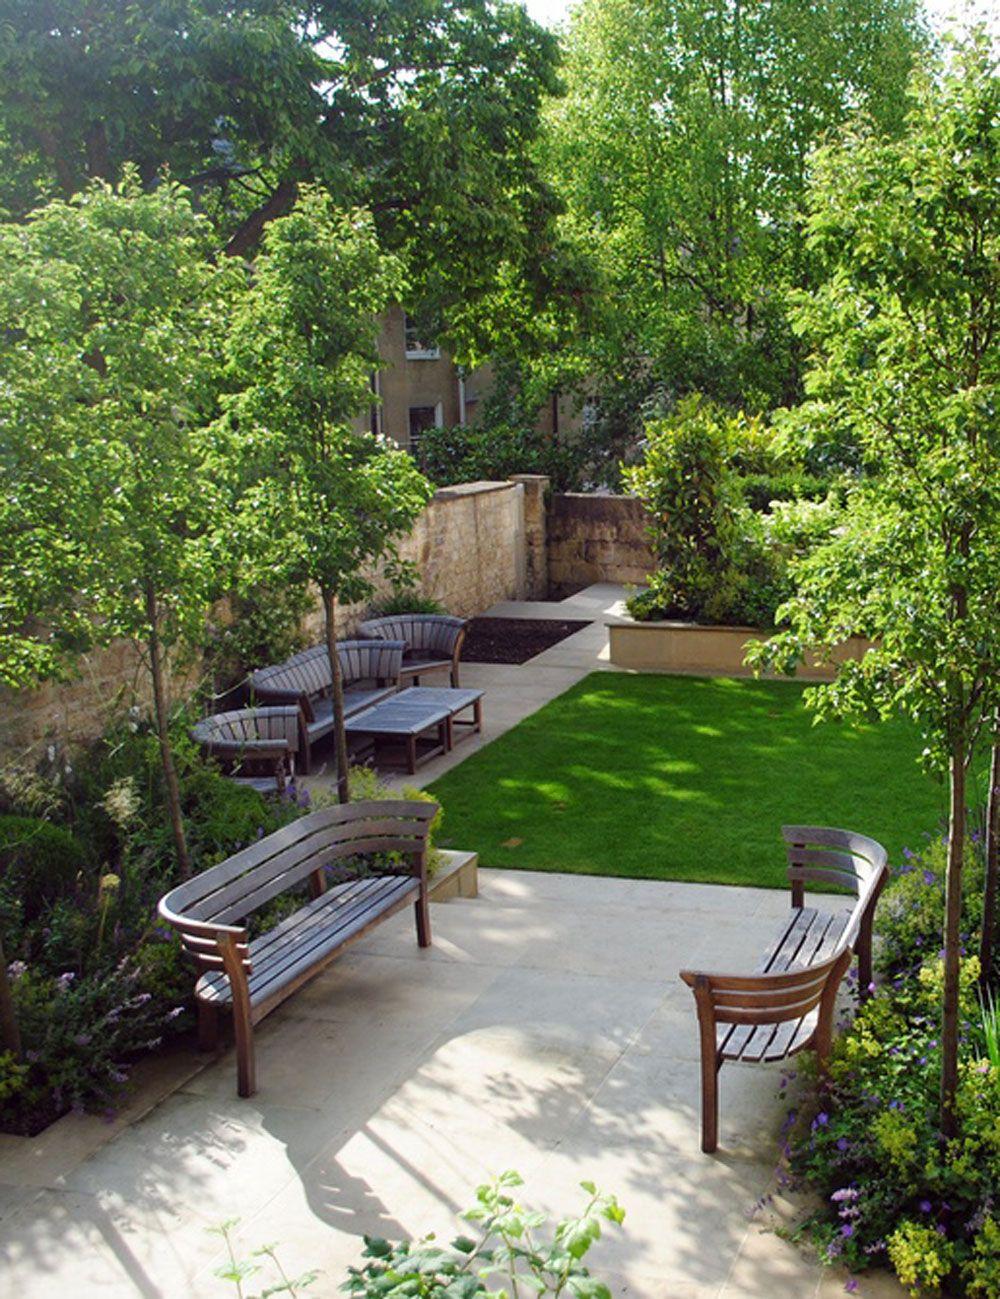 Butter Wakefield Garden Design - House & Garden, The List | Al ...